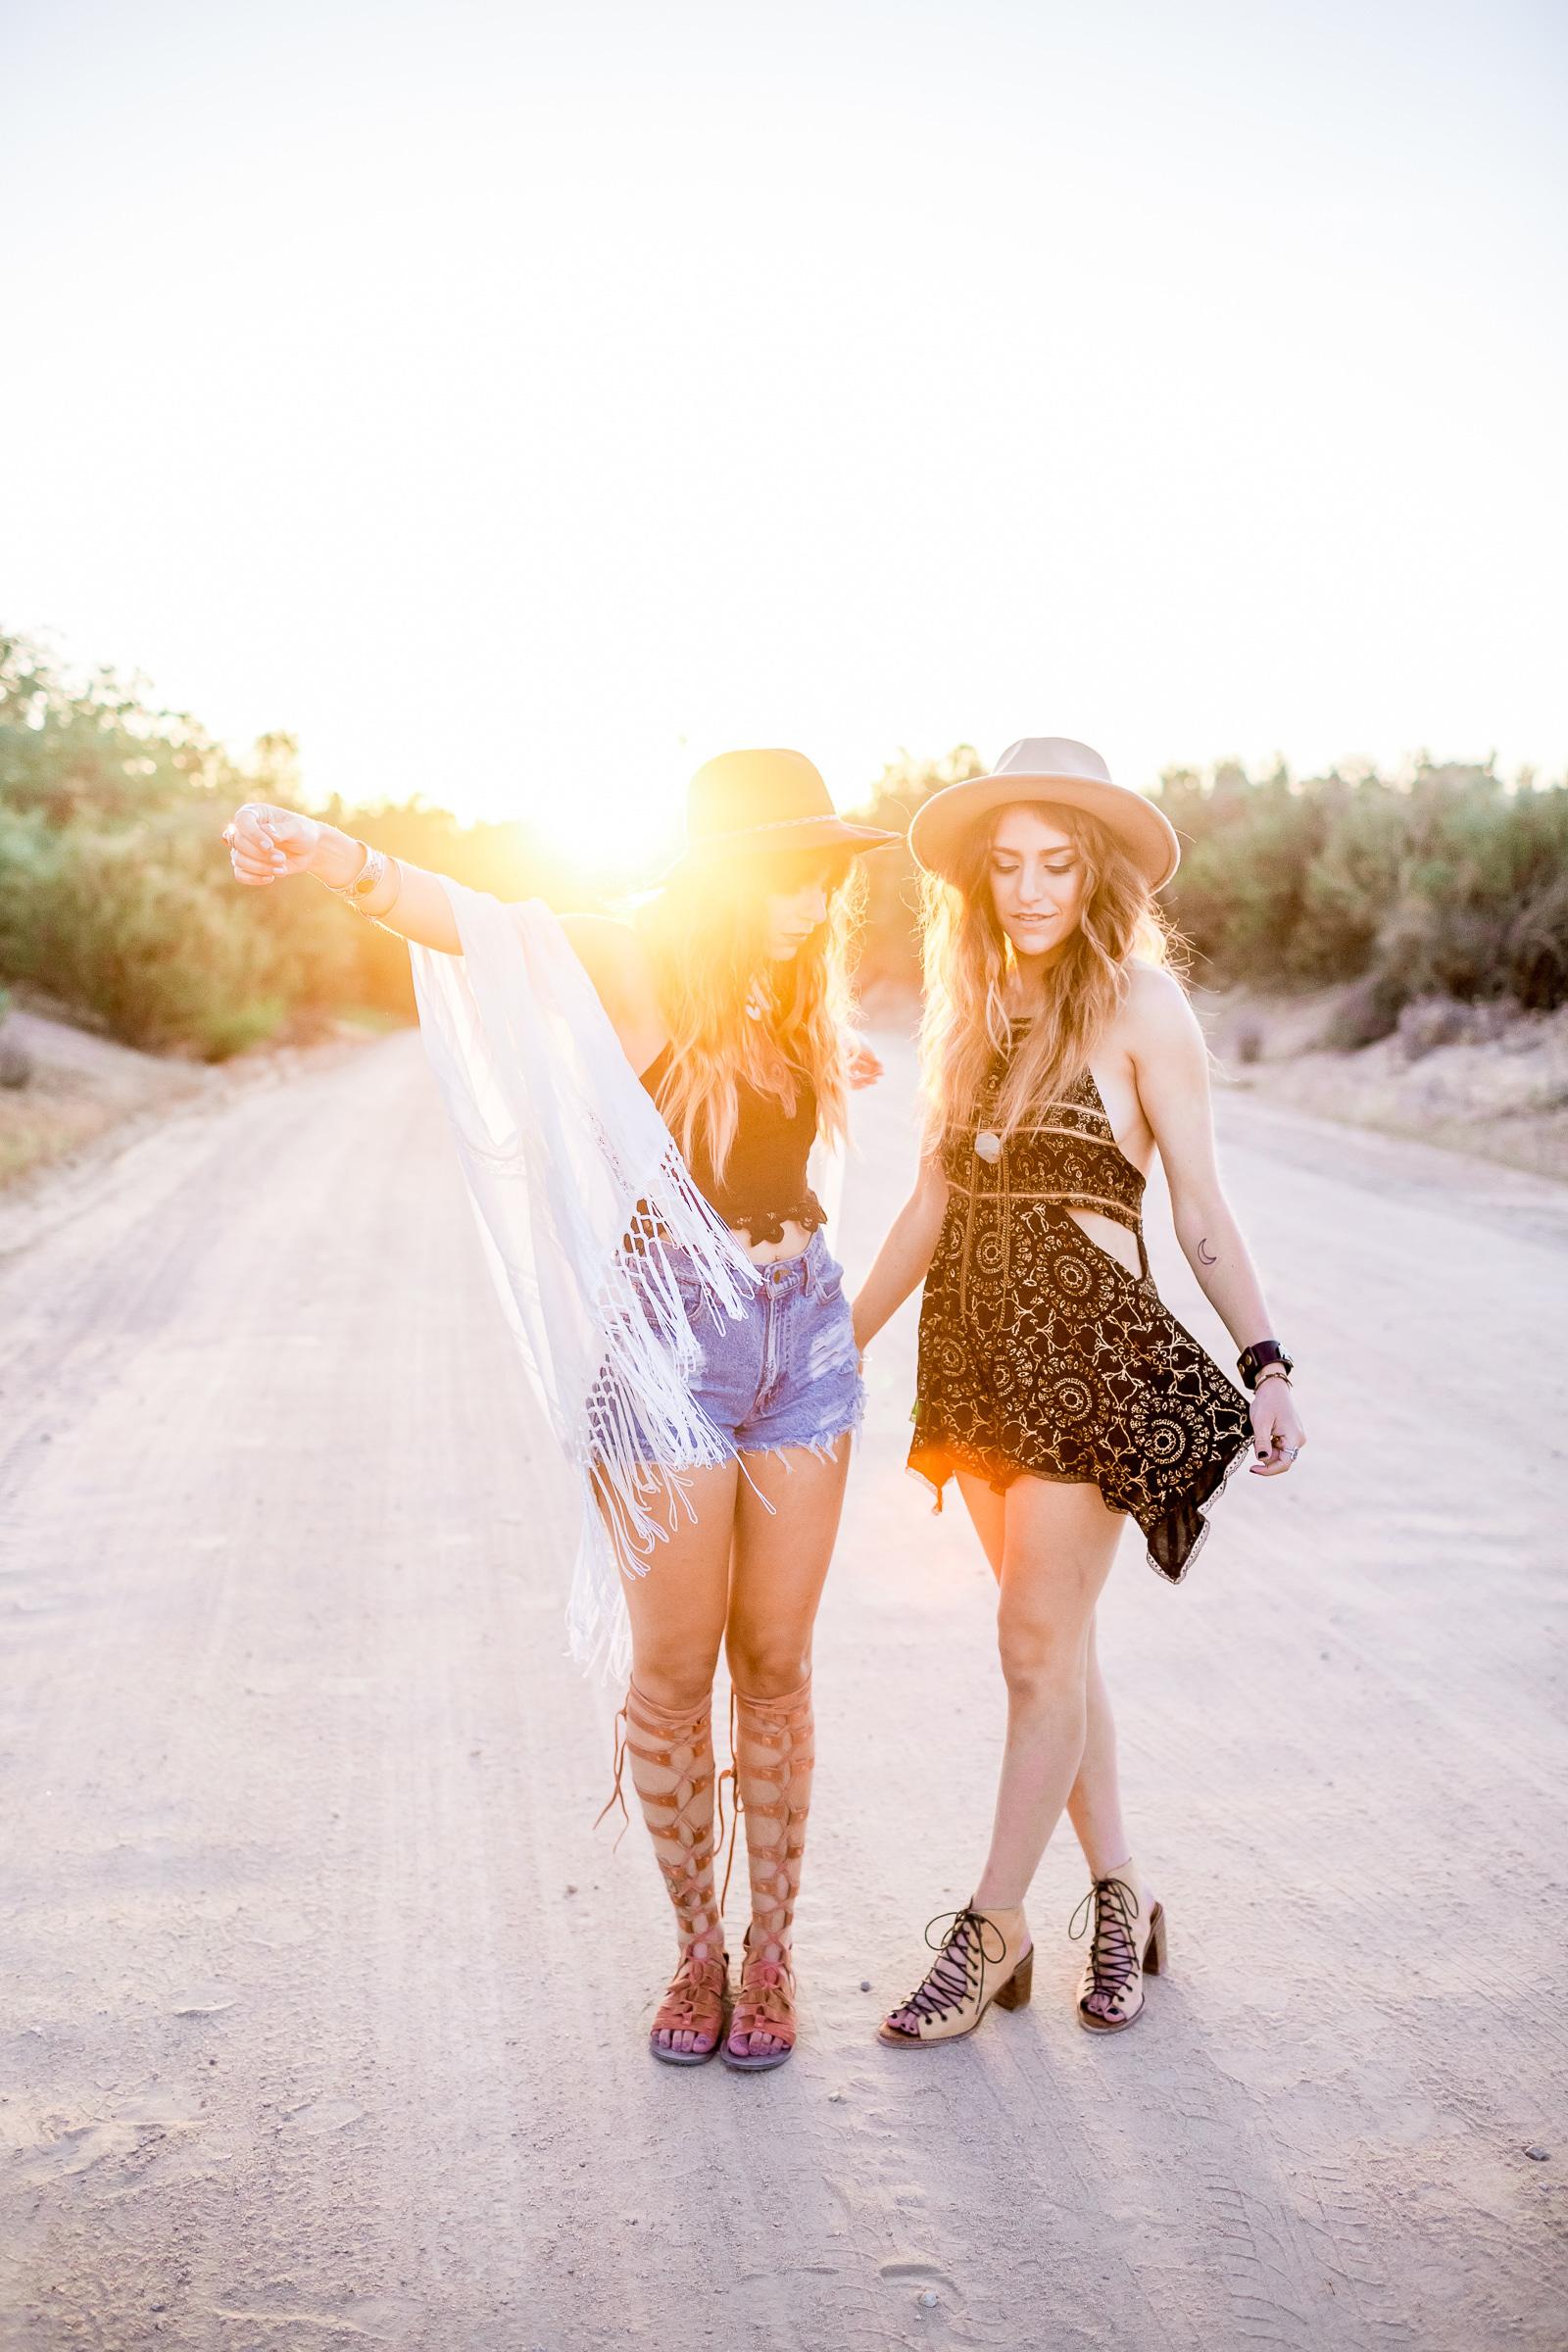 Festival-Stagecoach-Inspiration-Velvet-Sugar-Decorated-Mustang_14.jpg